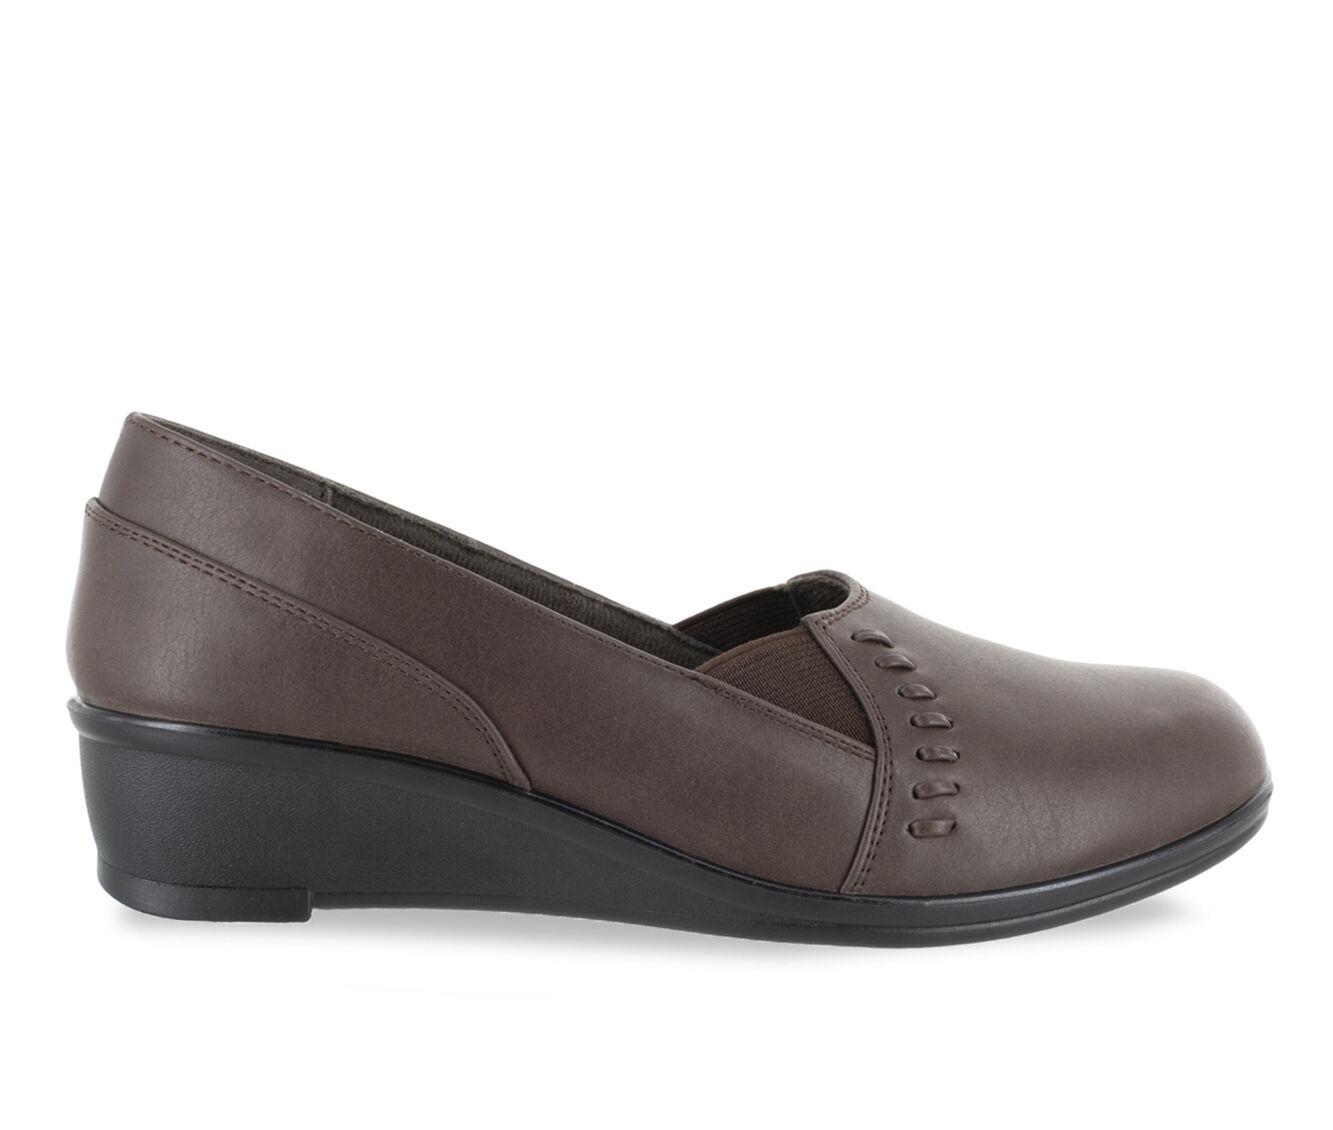 uk shoes_kd5785